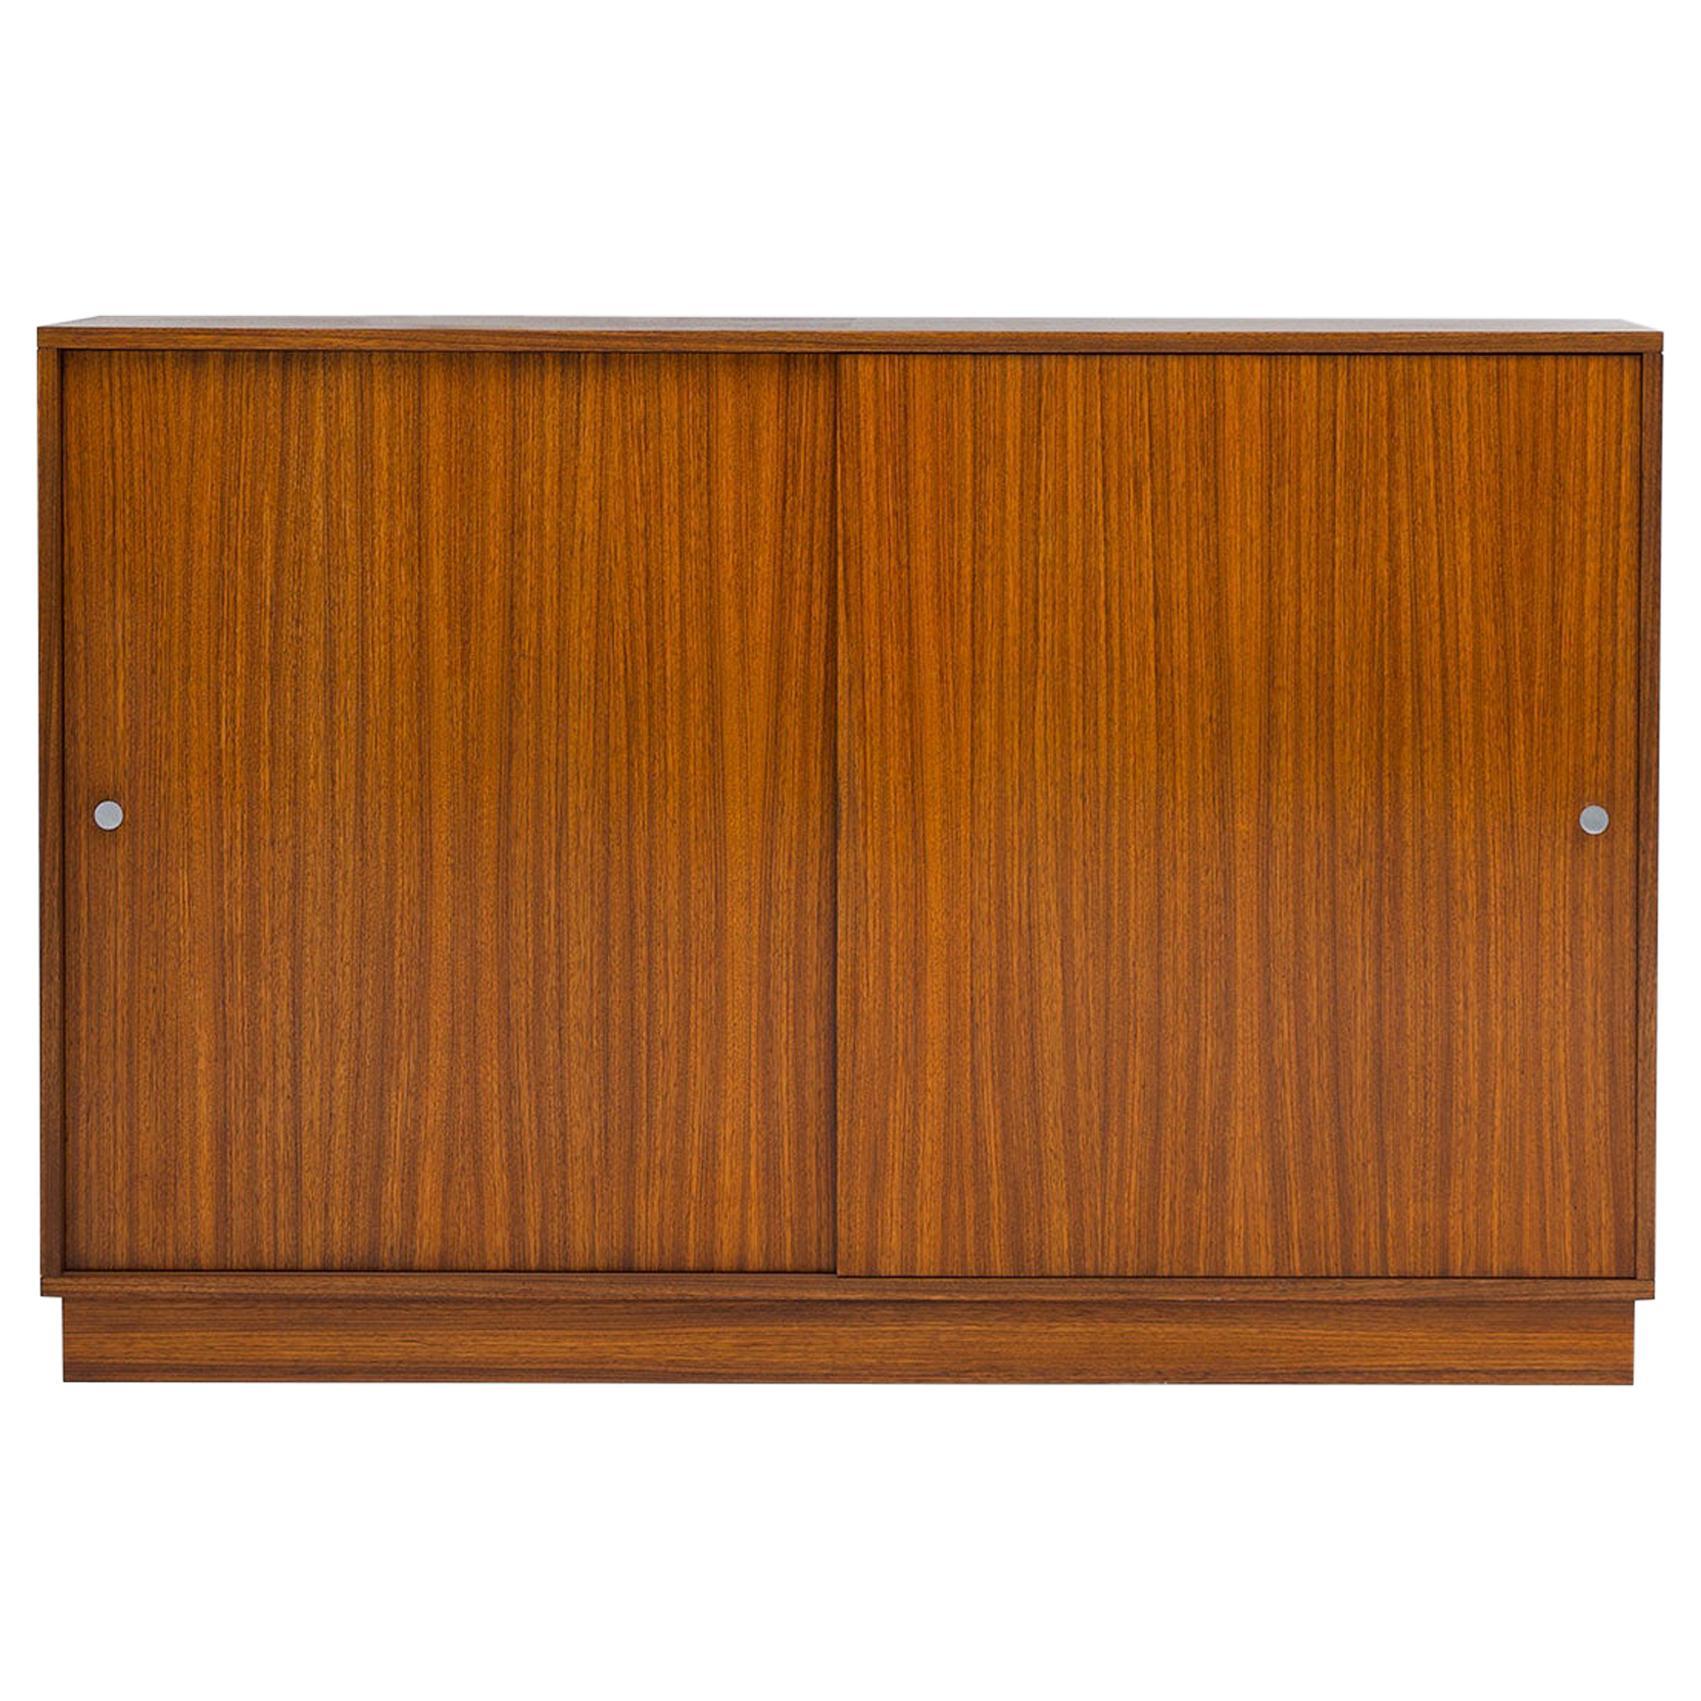 Zingana Dresser by Alfred Hendrickx Belform, 1960s